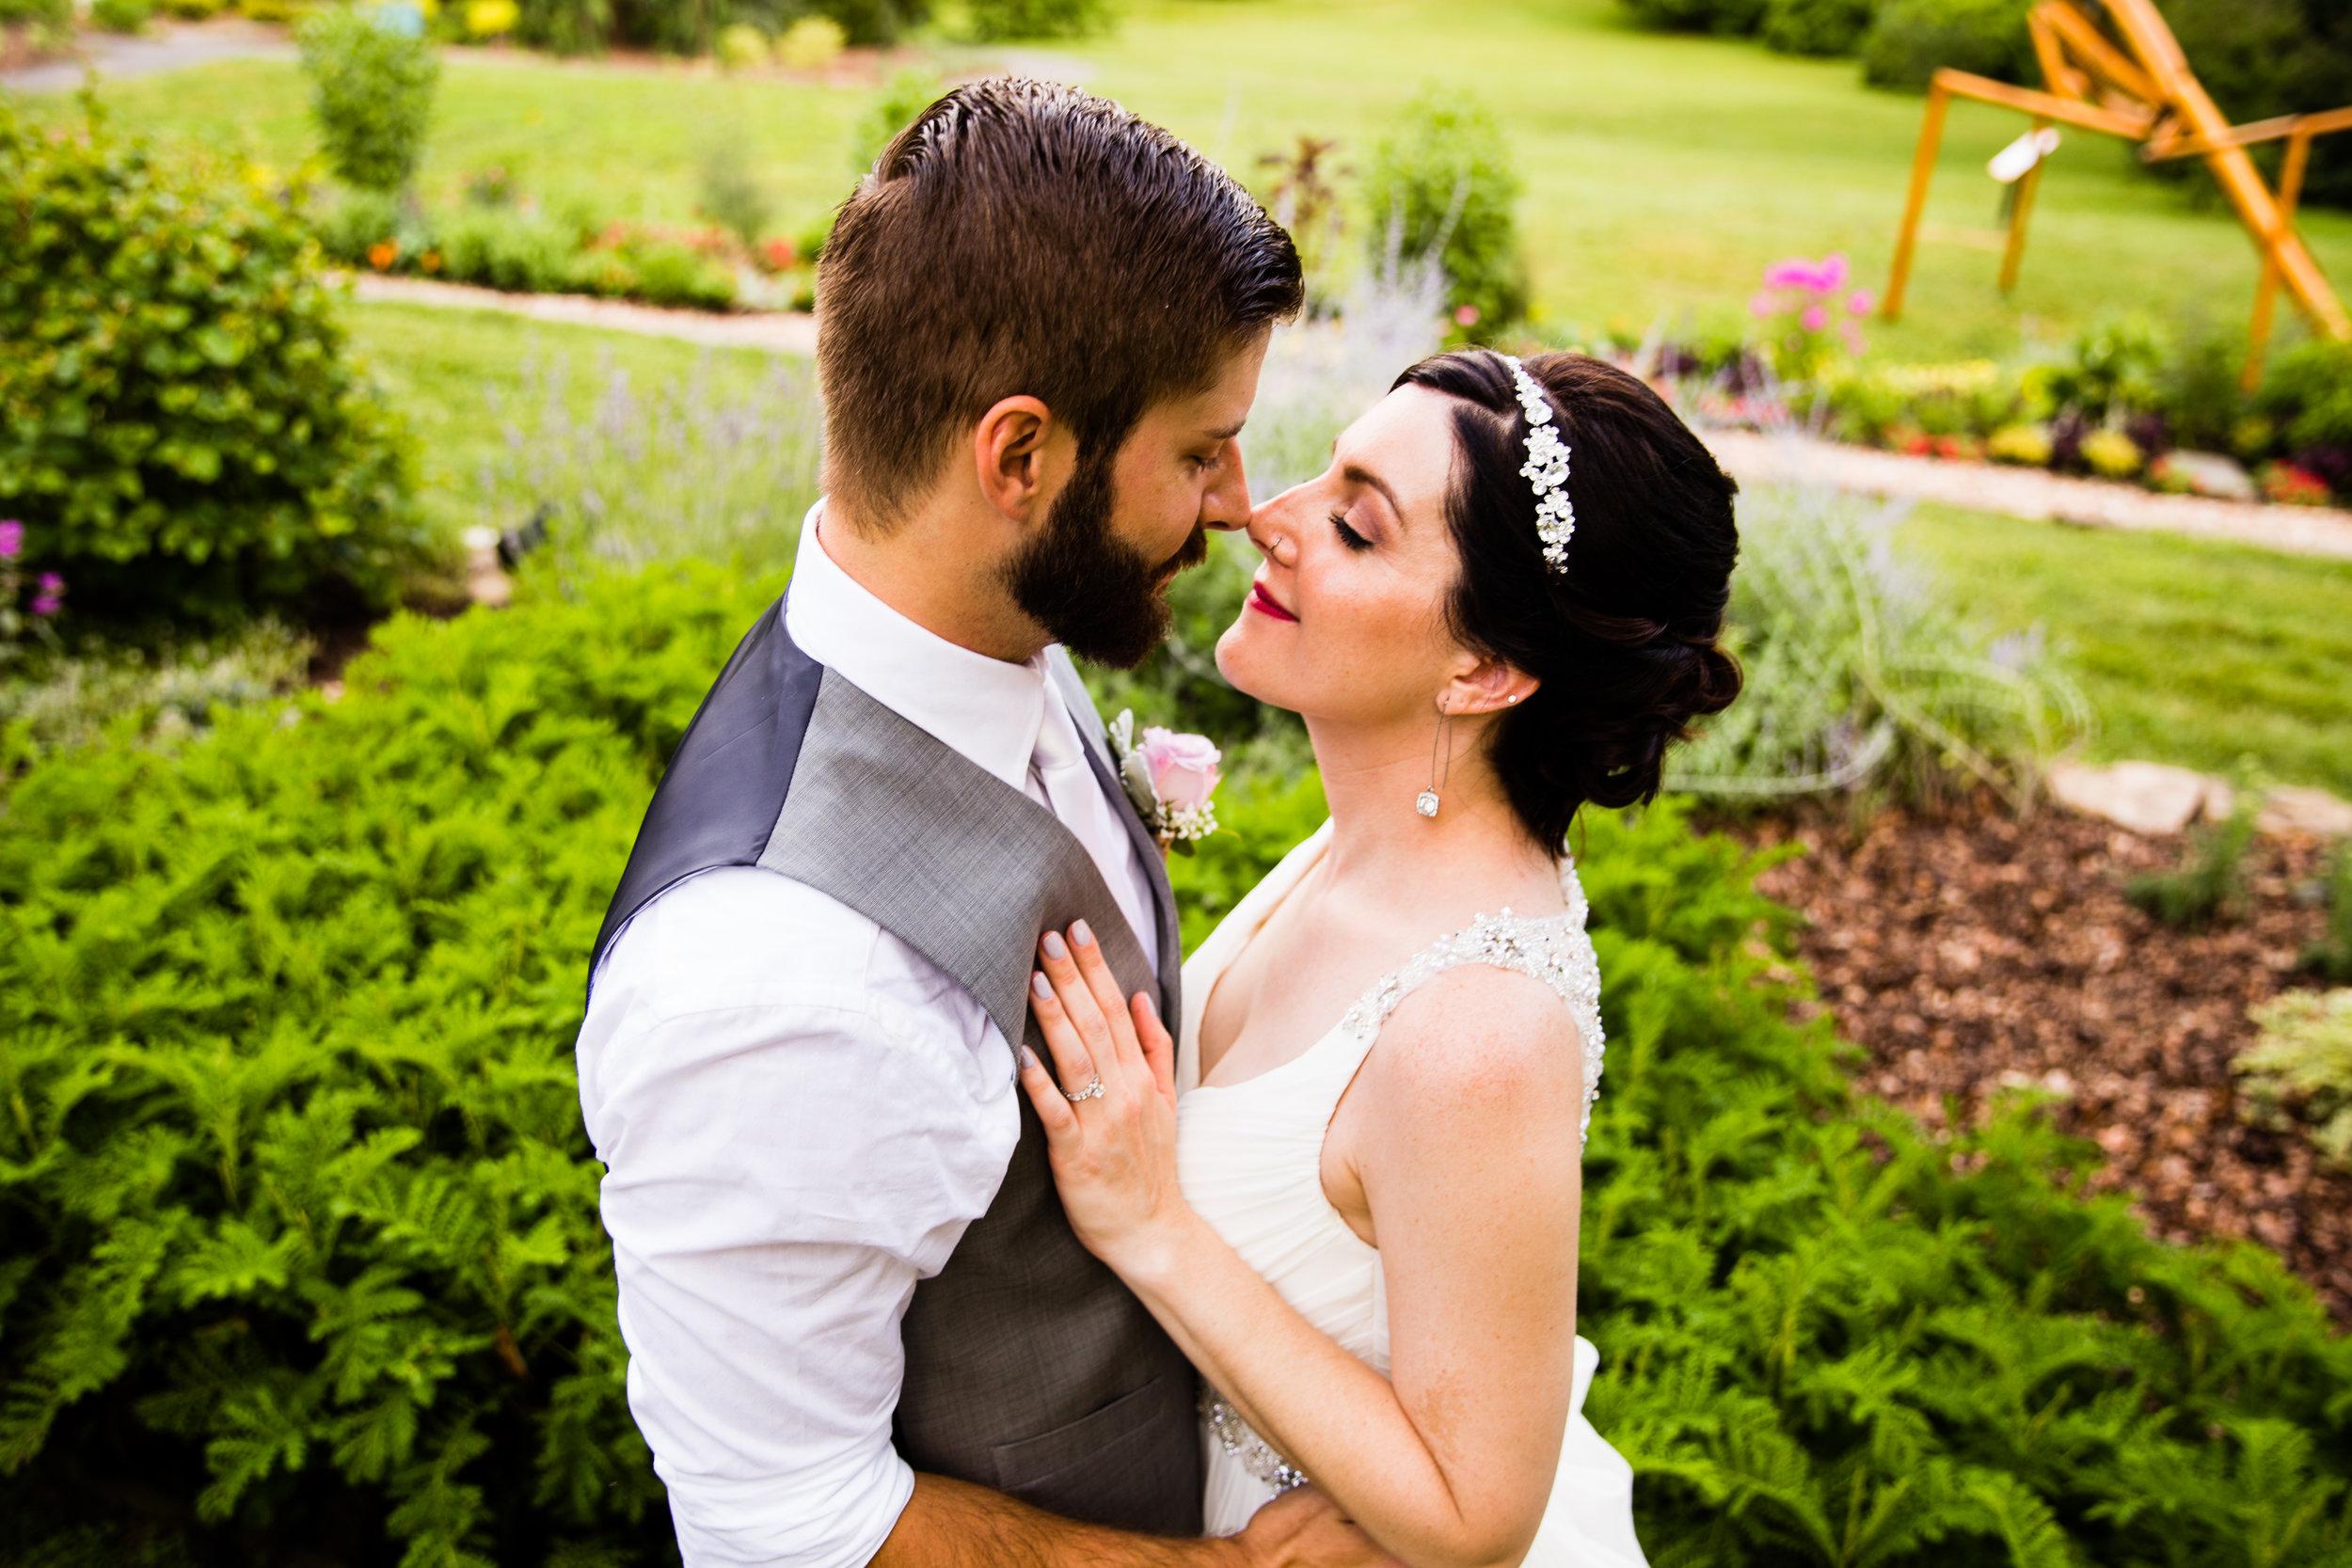 TYLER ARBORETUM WEDDING PHOTOGRAPHY LOVESTRUCK PICTURES-041.jpg